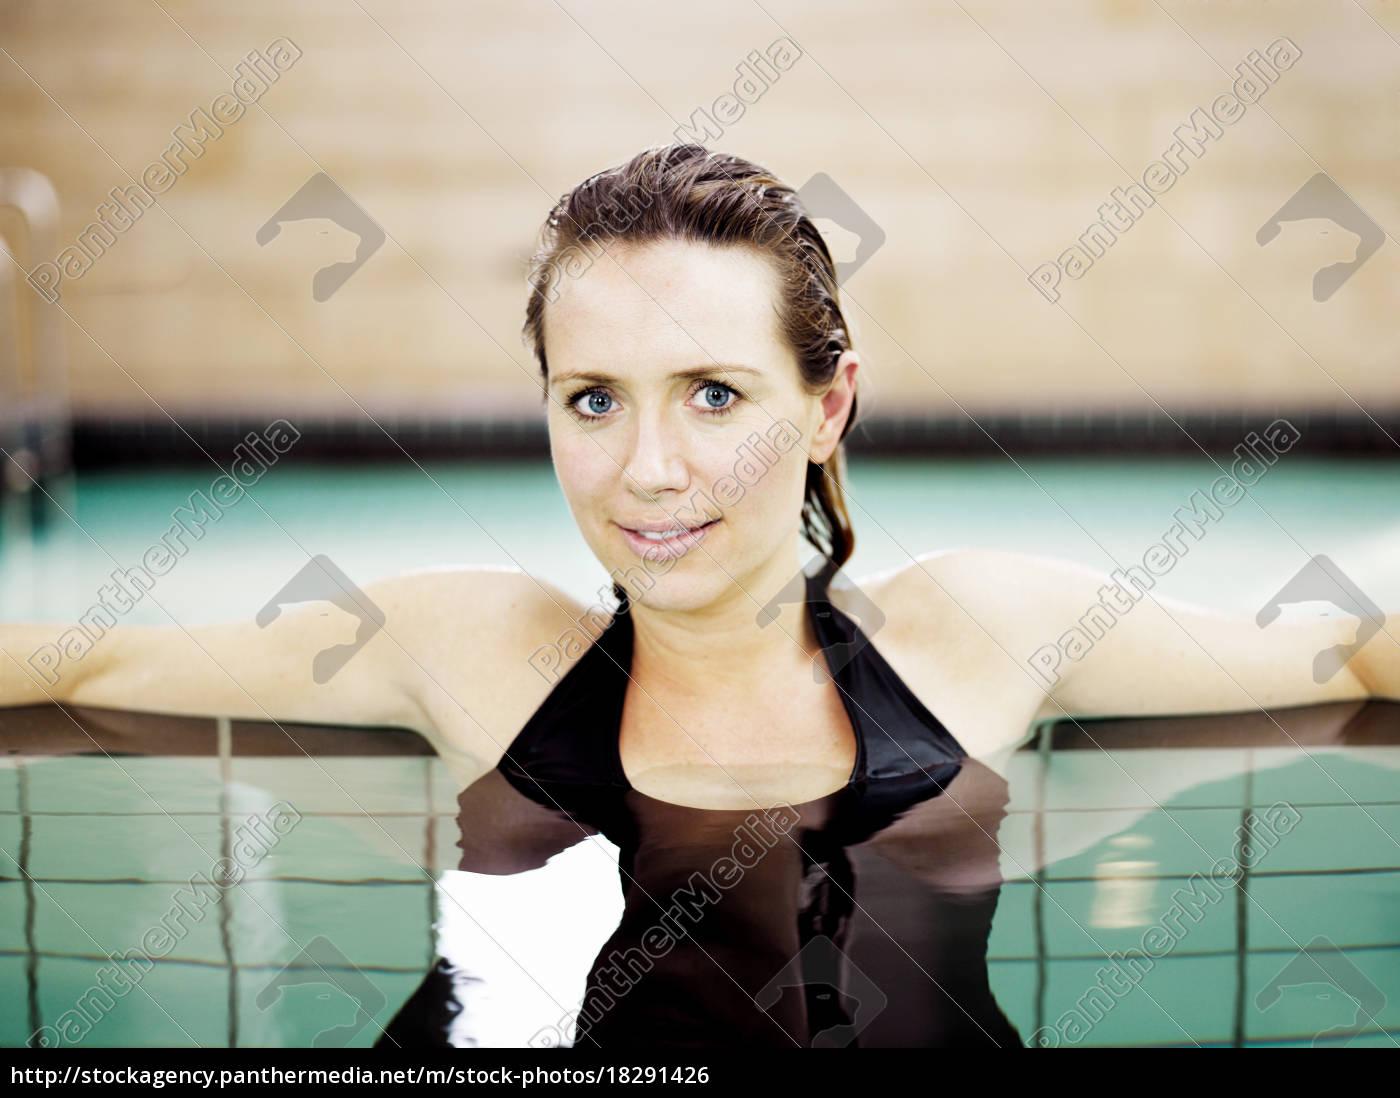 woman, in, swimming, pool, smiling - 18291426